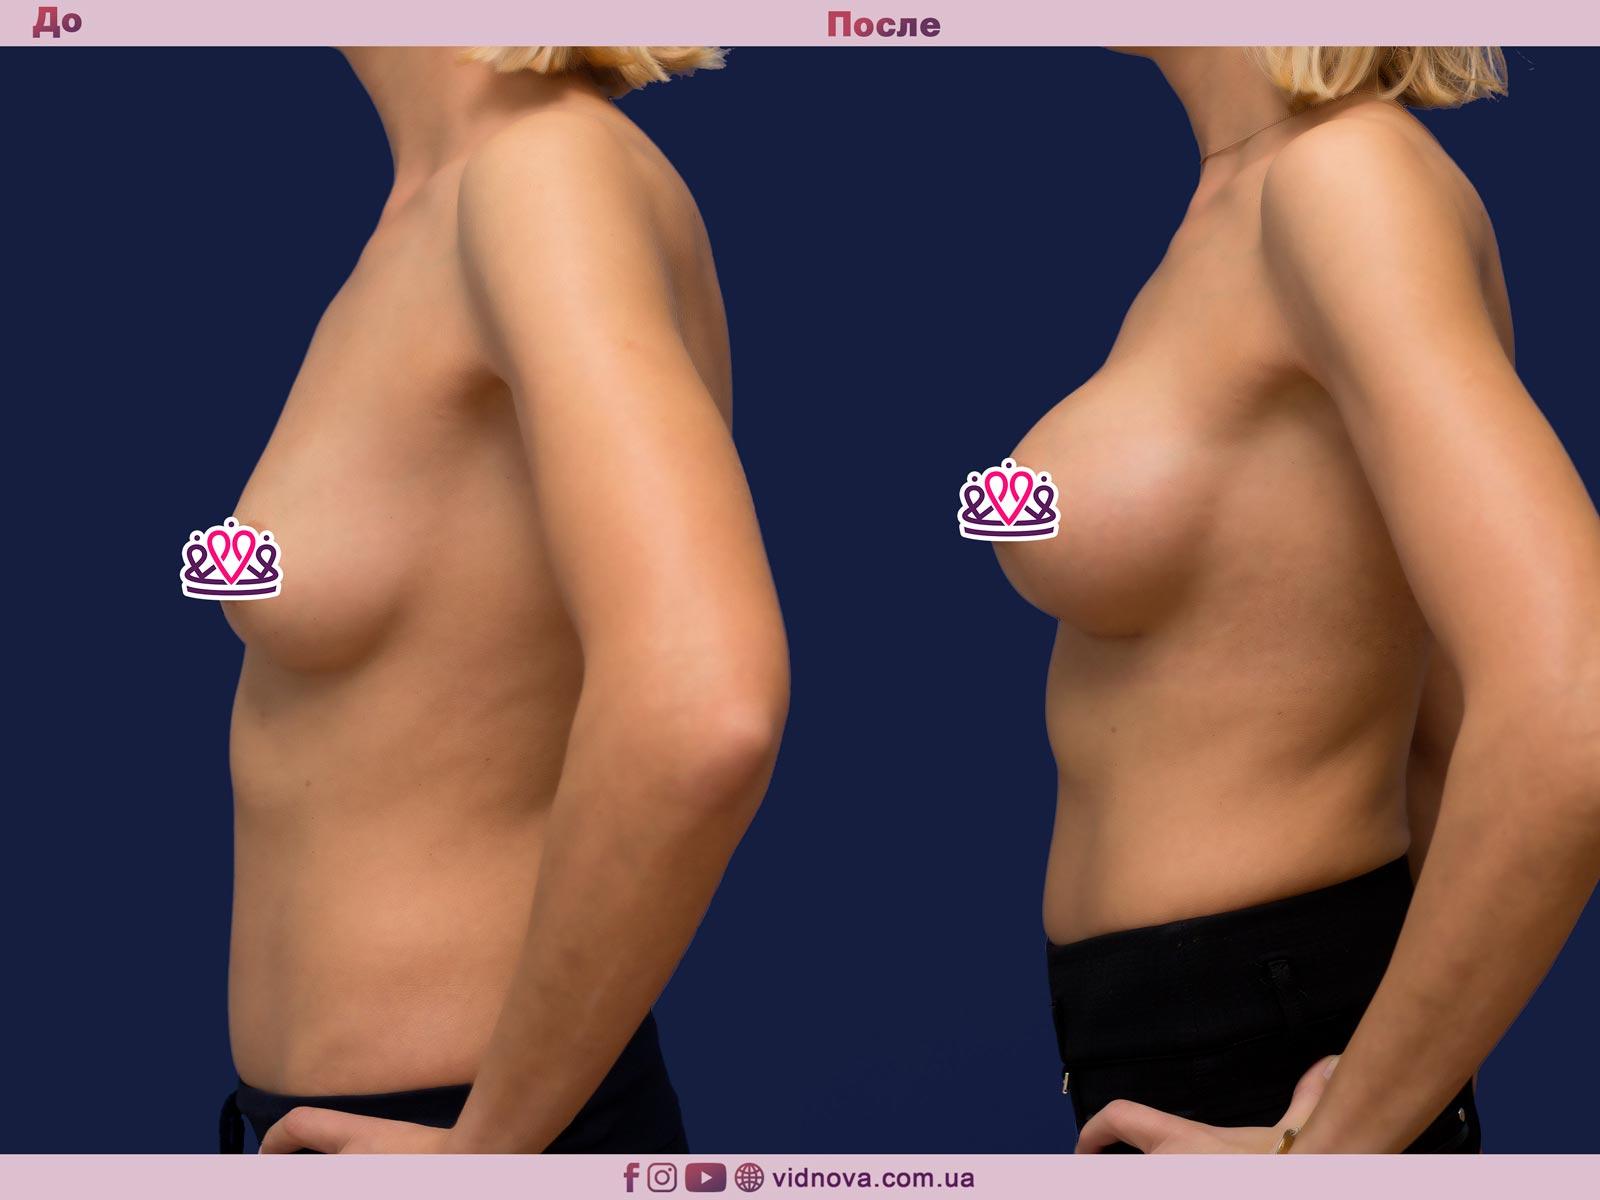 Увеличение груди: Фото ДО и ПОСЛЕ - Пример №81-3 - Клиника Vidnova